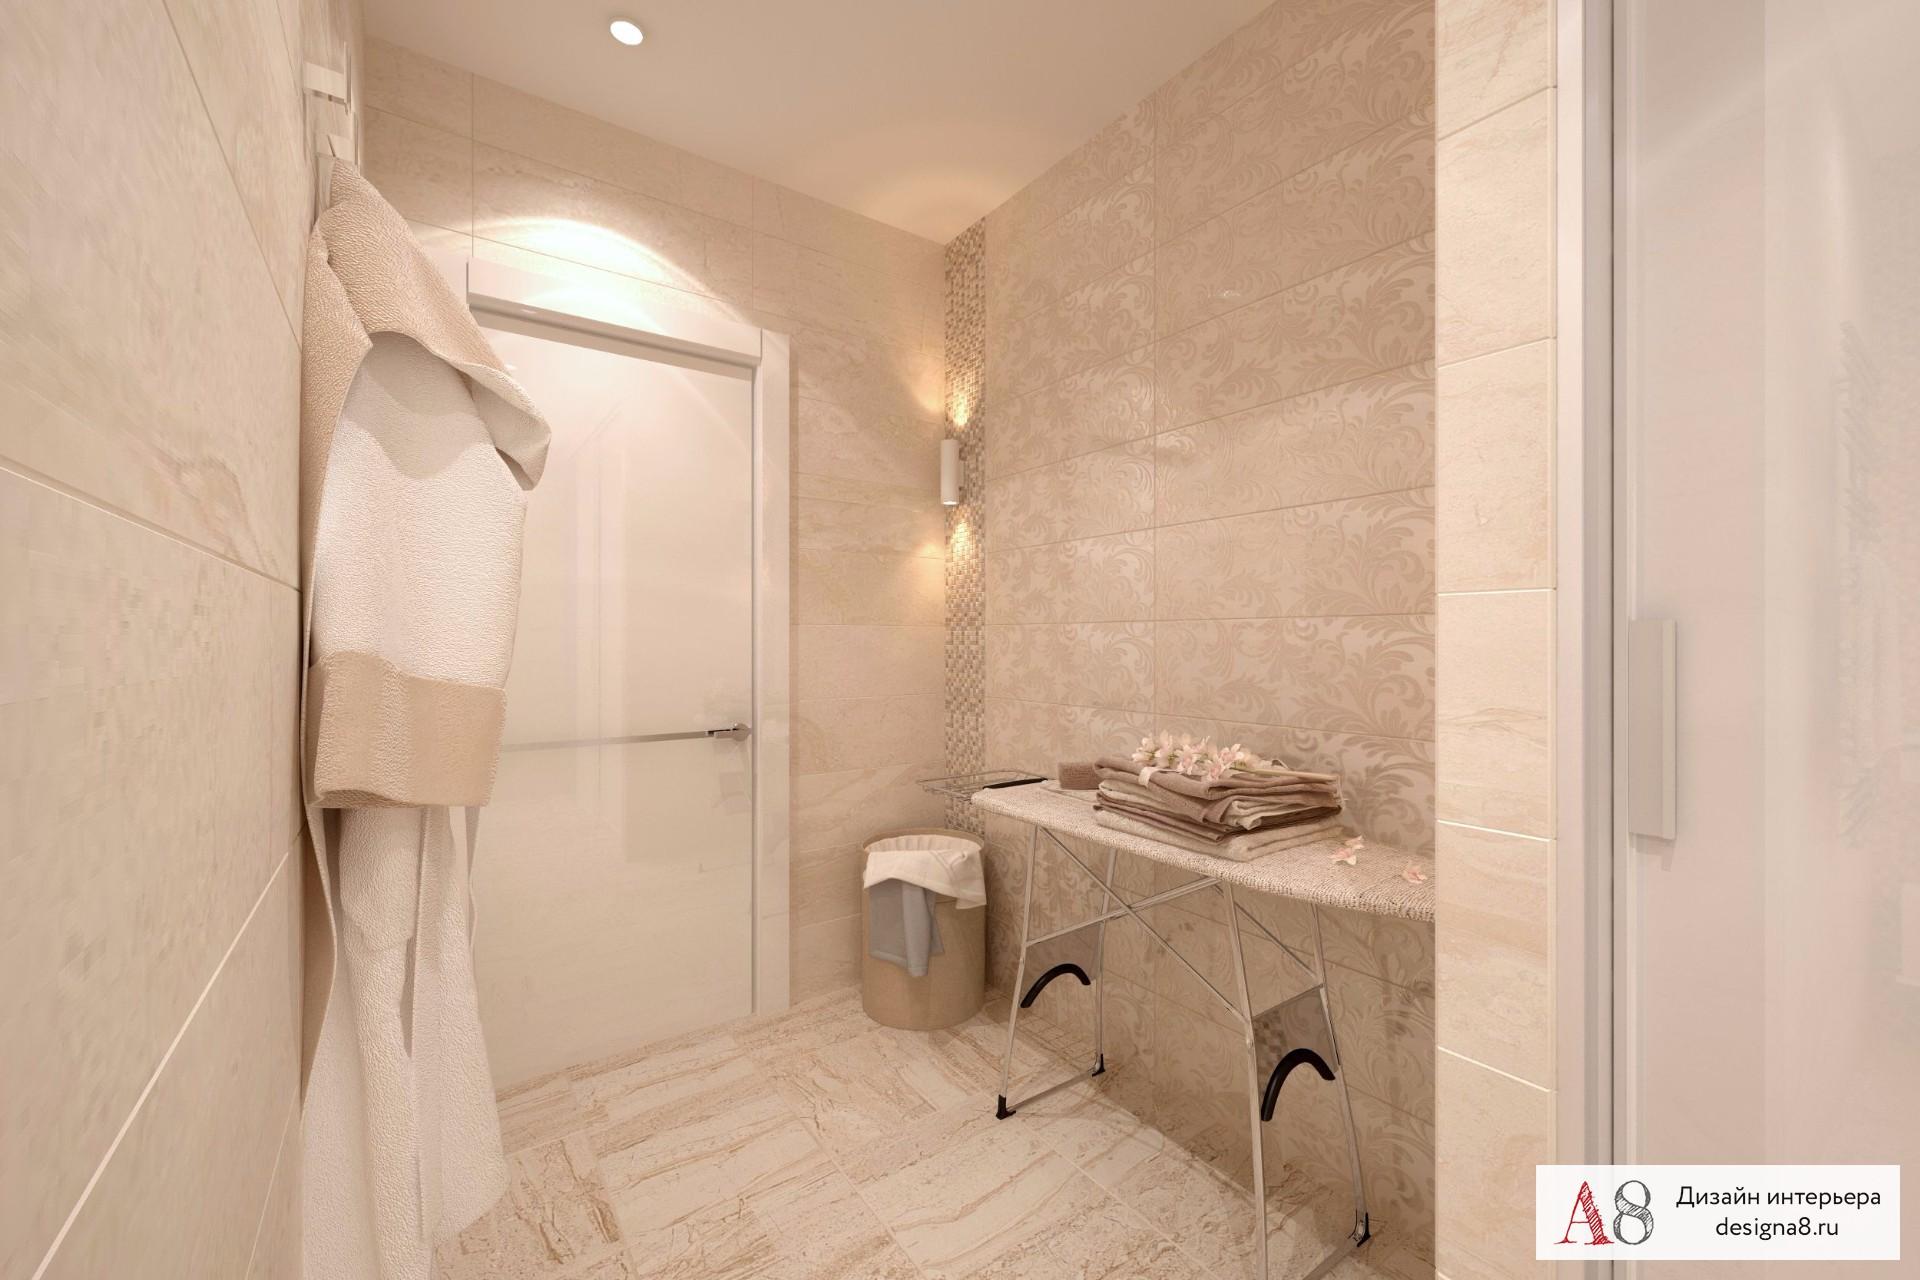 Ванна дизайн для трехкомнатной квартиры